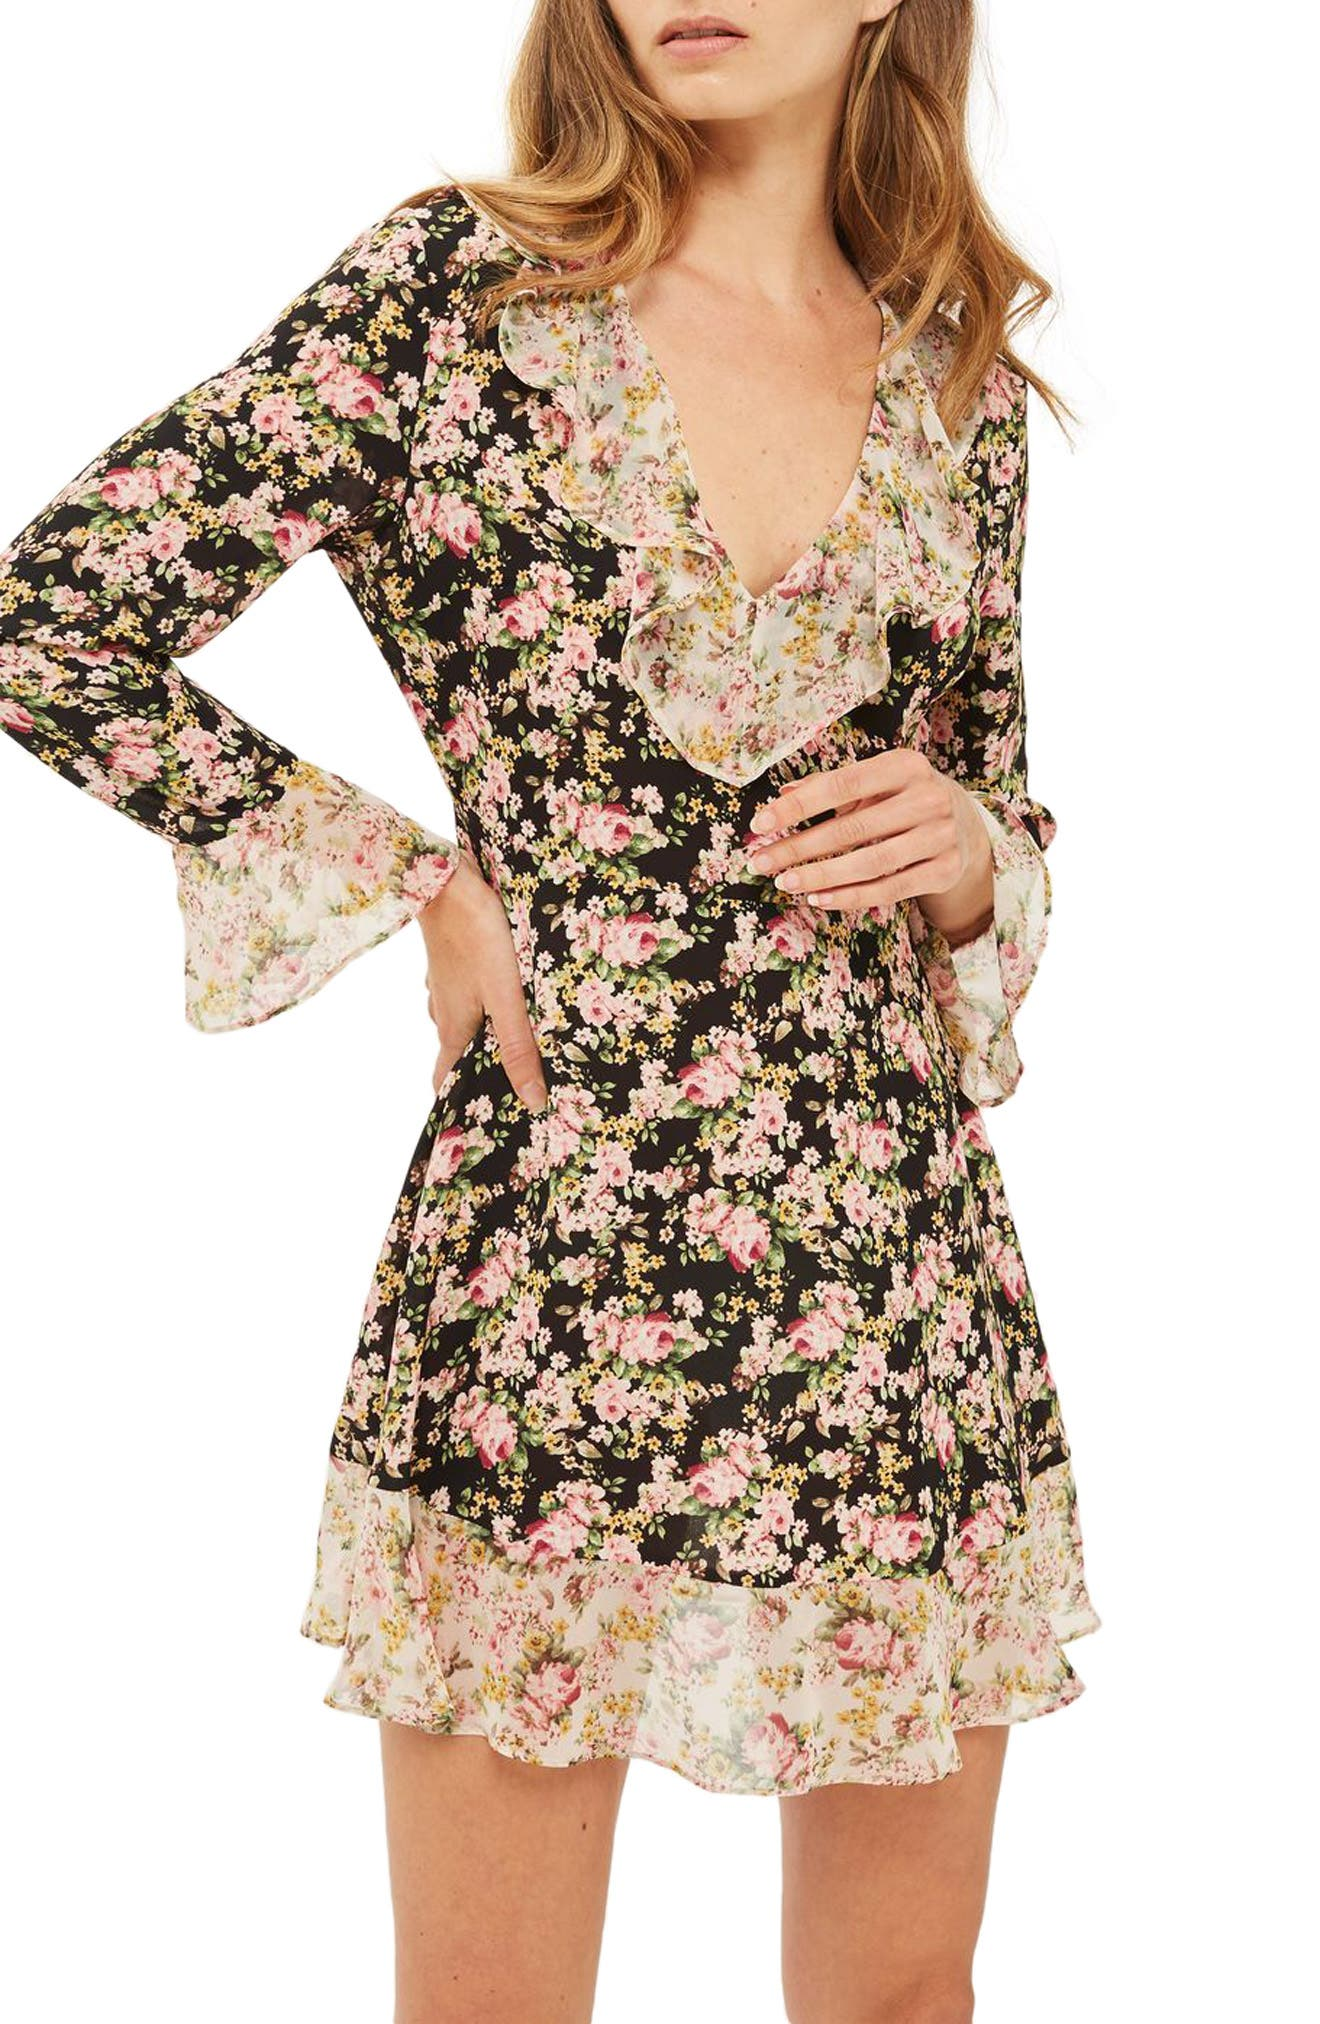 True Romance Ruffle Minidress,                         Main,                         color, 001